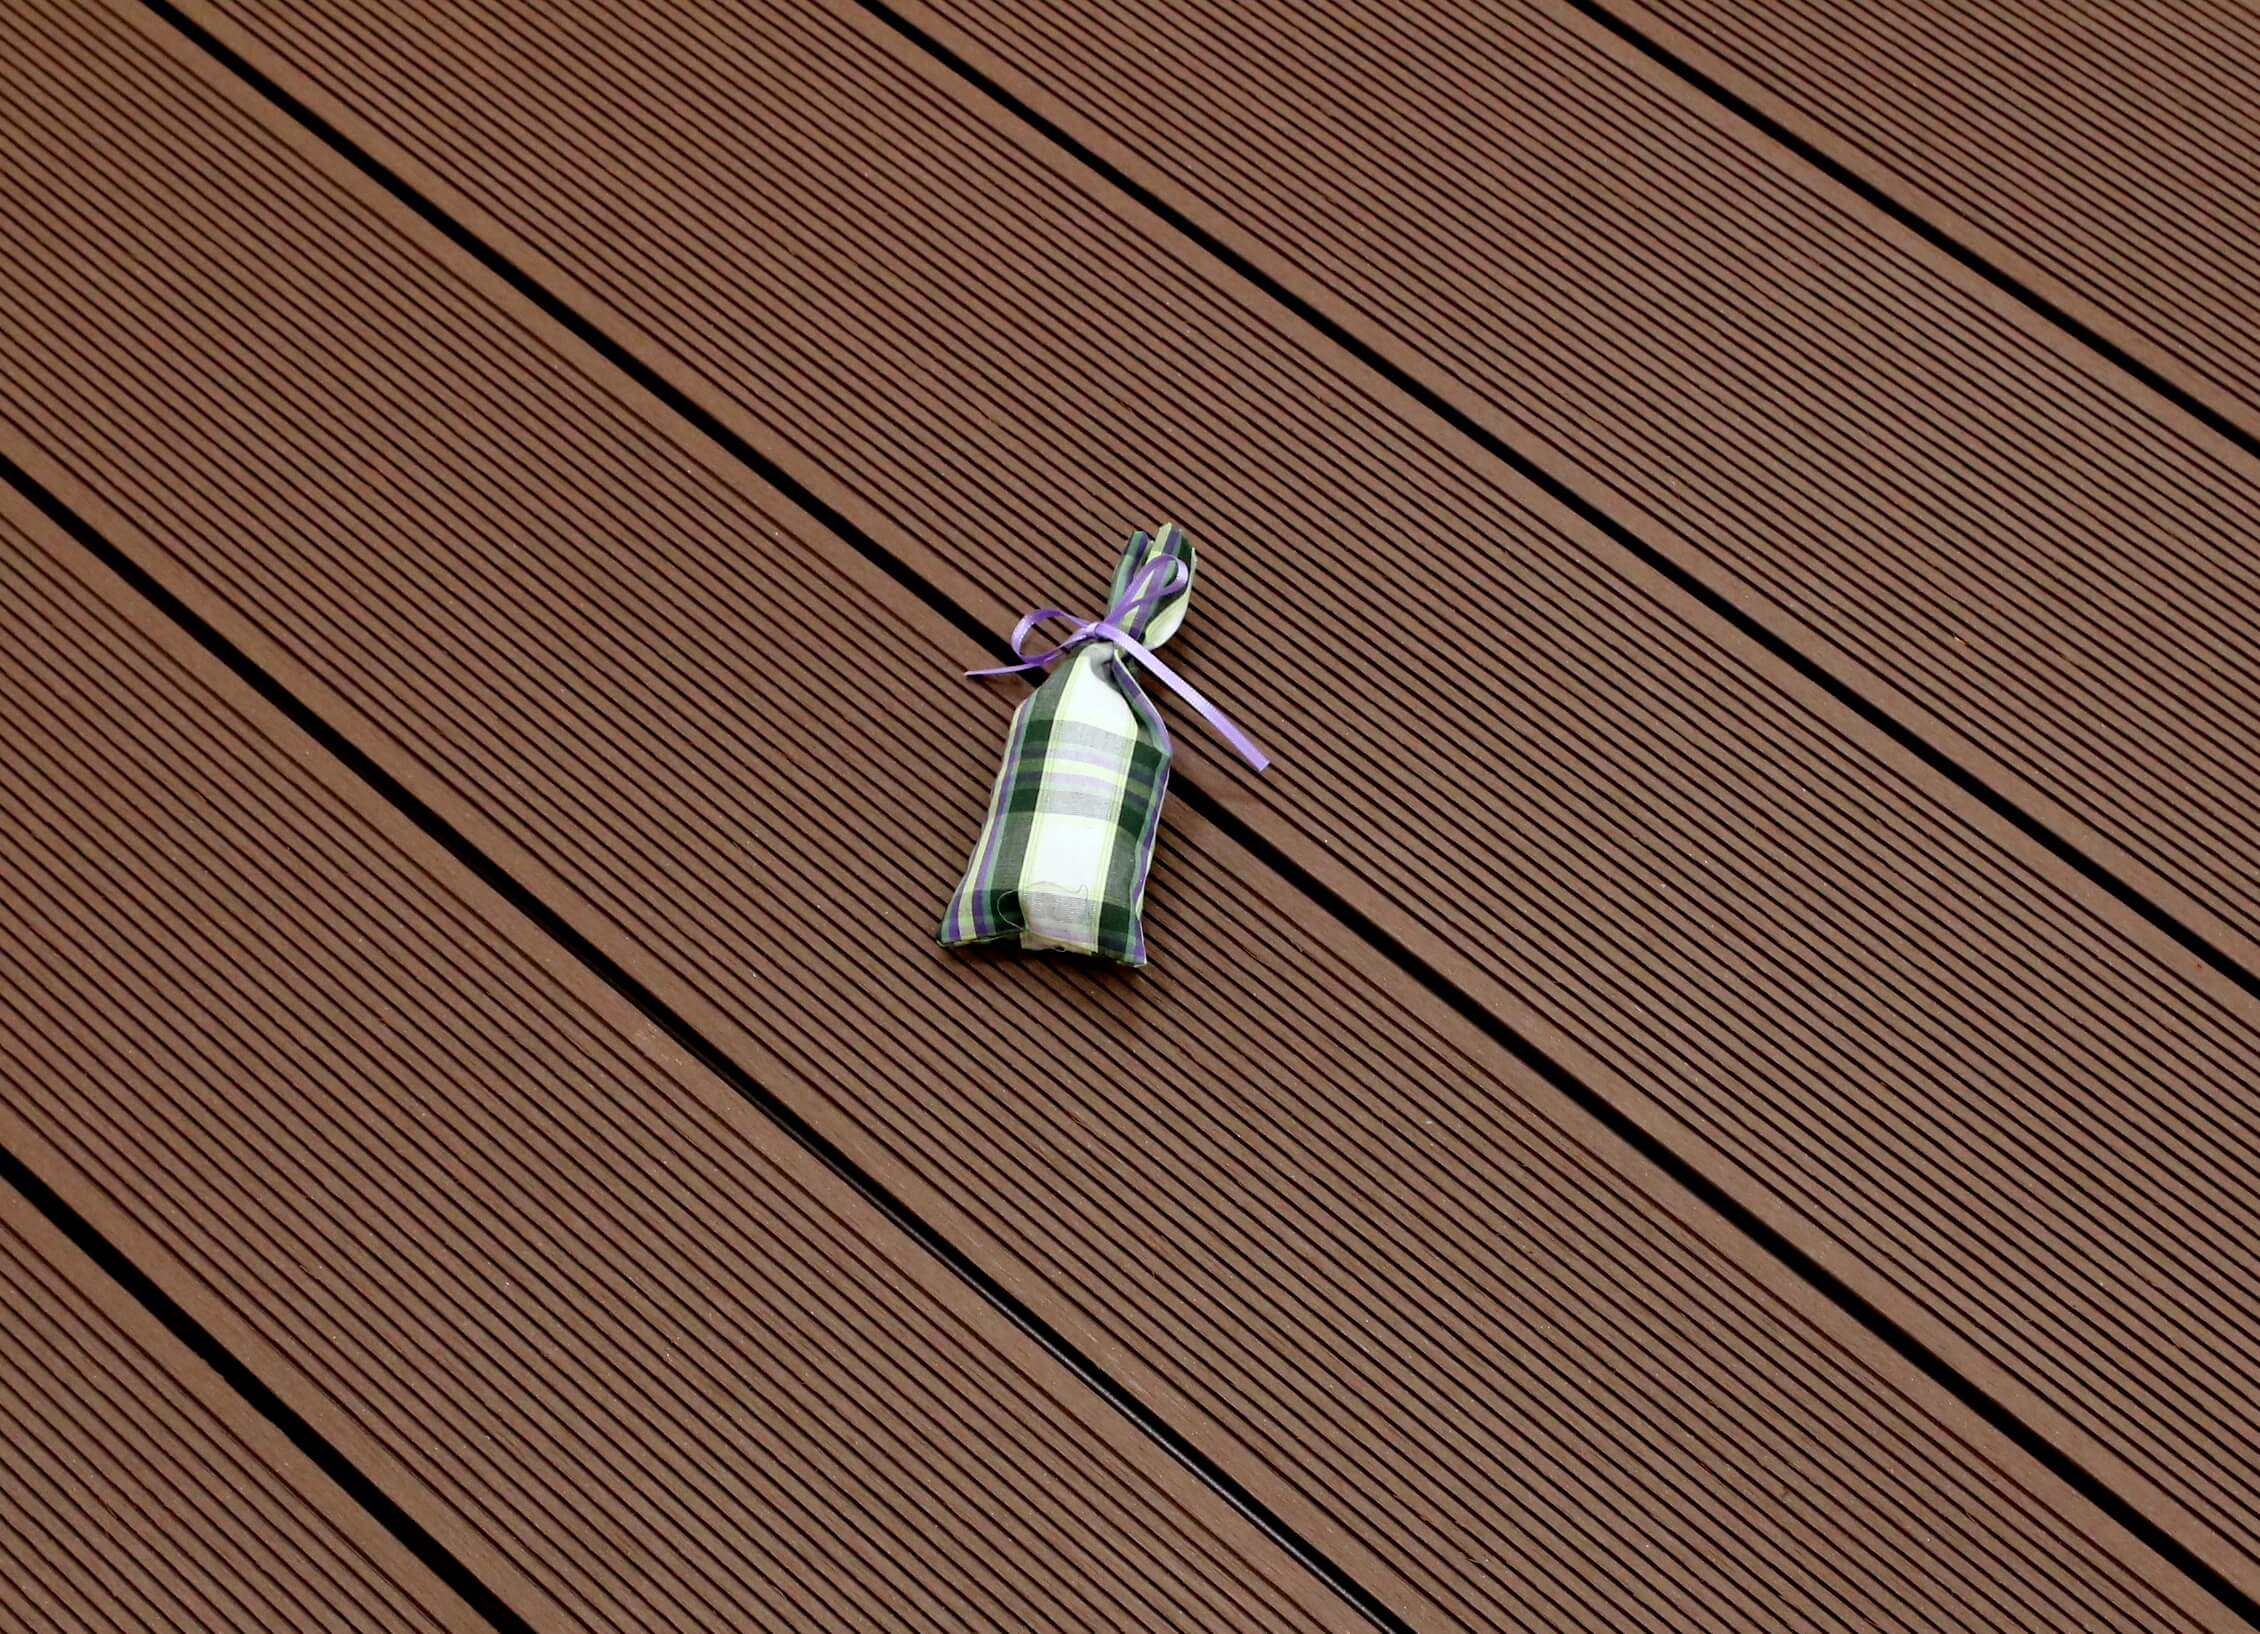 WPC Terrasse massiv, dunkelbraun, Oberfläche fein gerillt, 22 x 143 bis 4800 mm, Vollprofil, 7,90 €/lfm